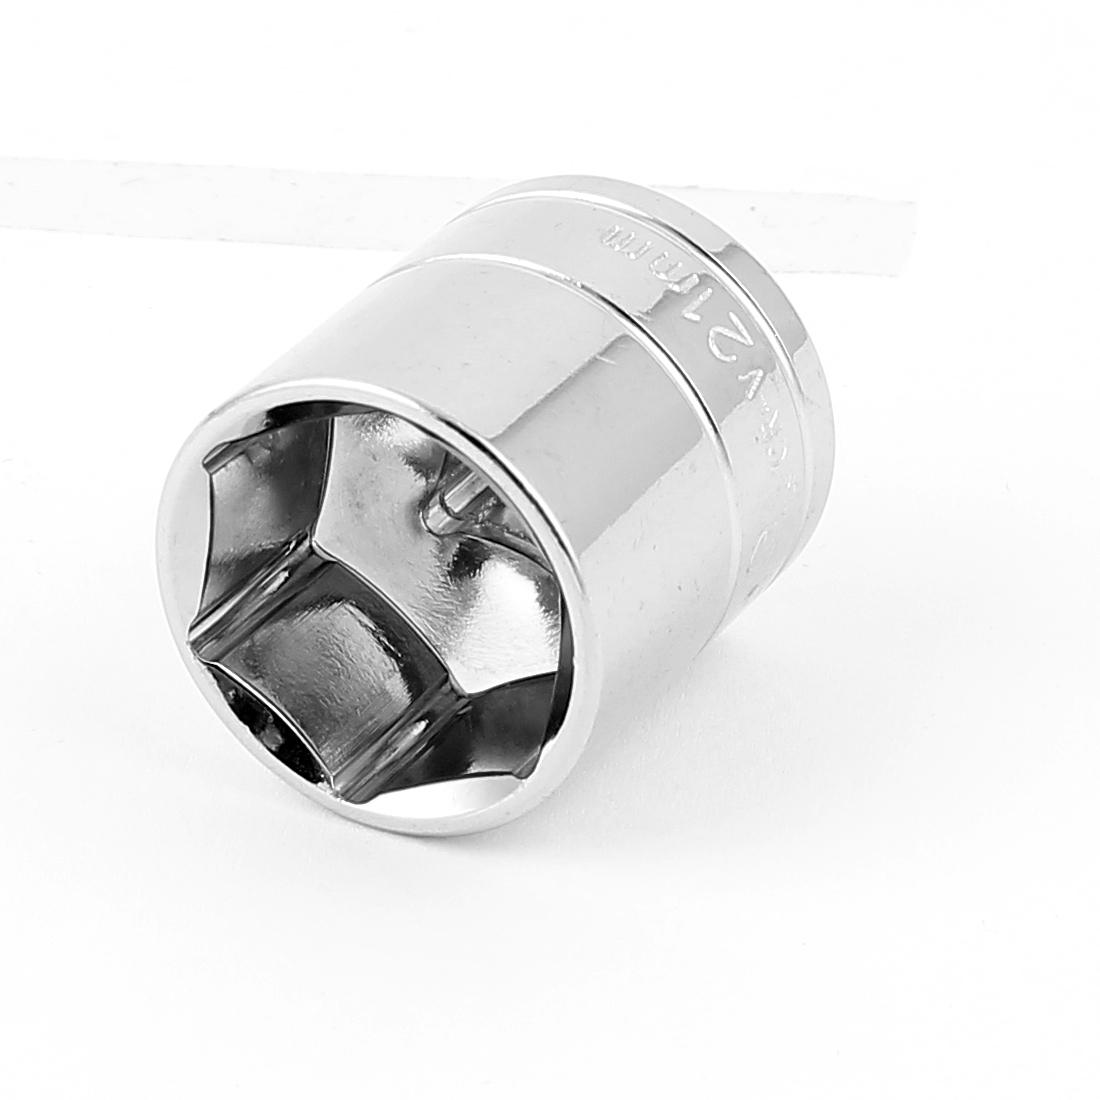 "3/8"" Drive Chrome-vanadium Steel Metric 6 Point Axle Nut Hex Socket 21mm"